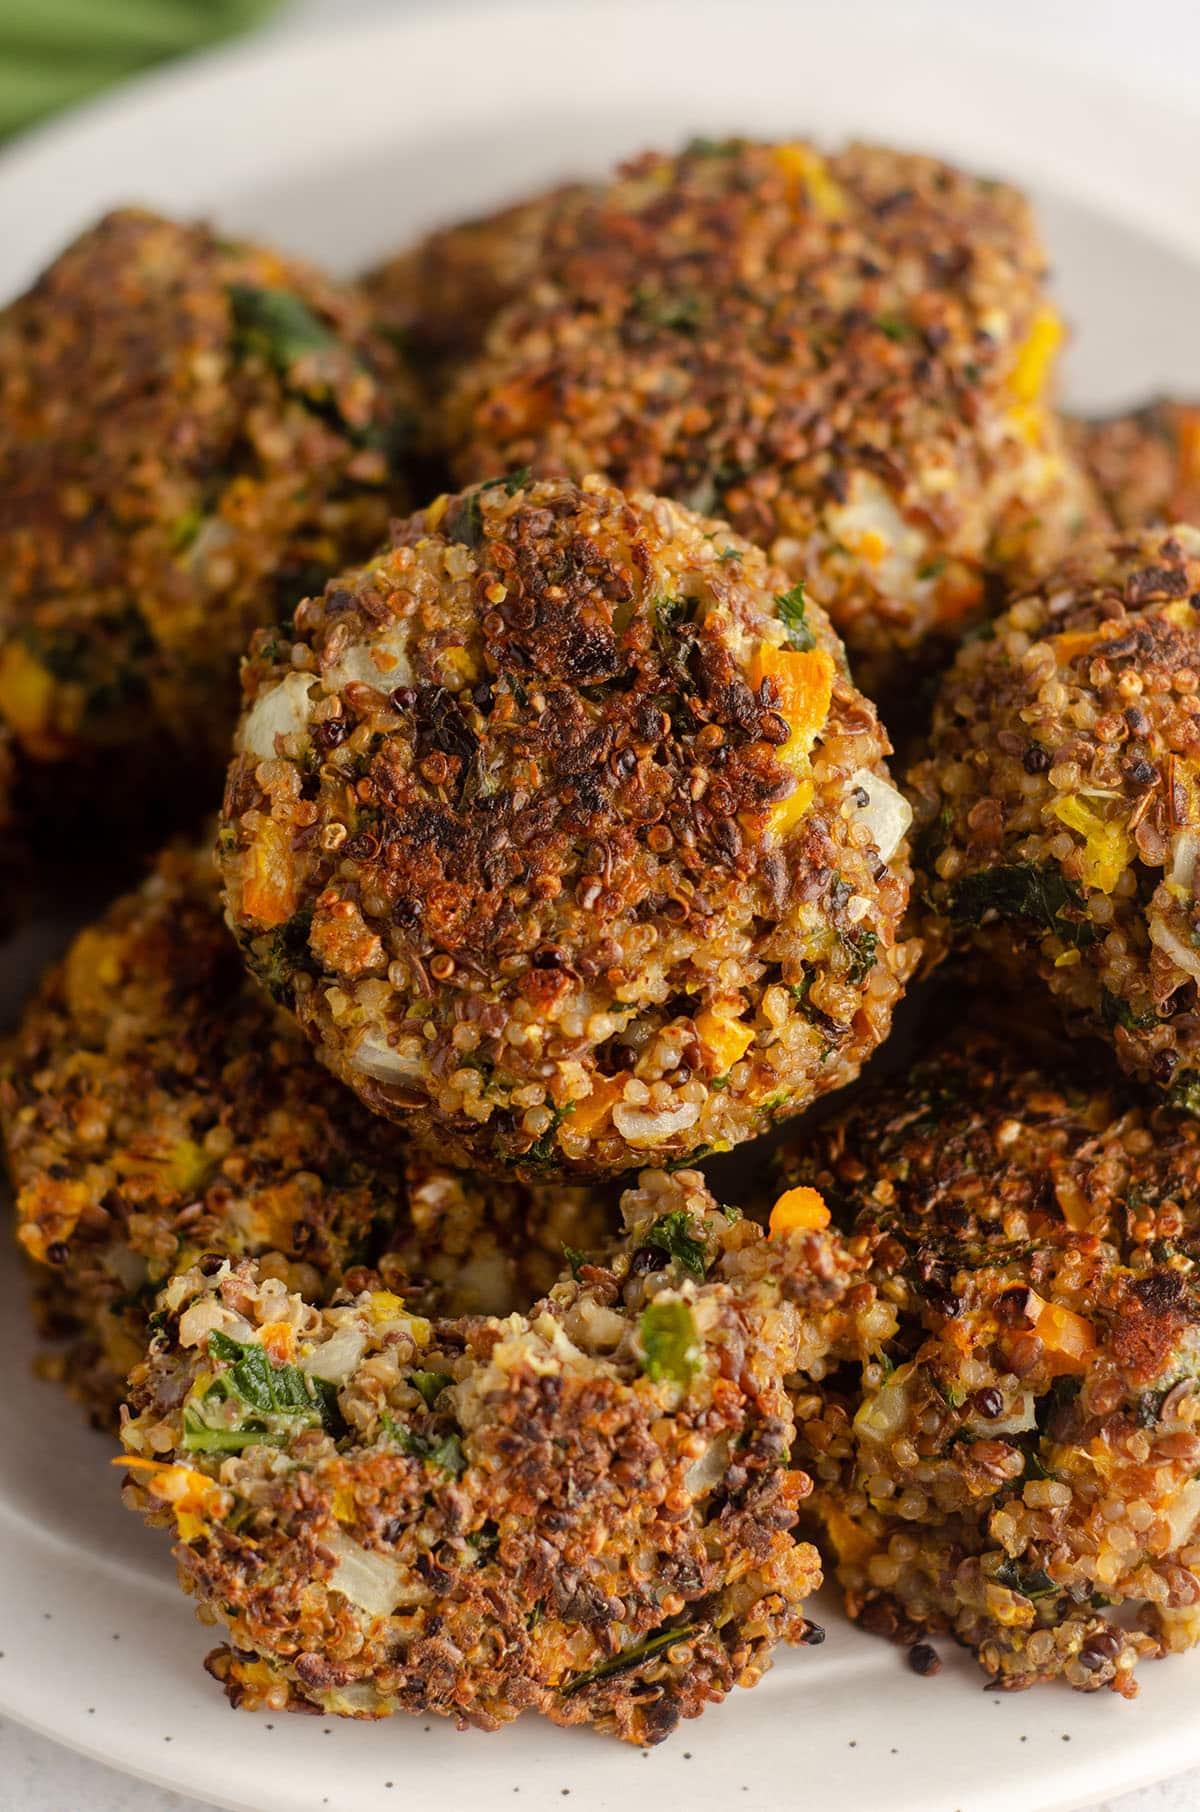 quinoa patties on a plate